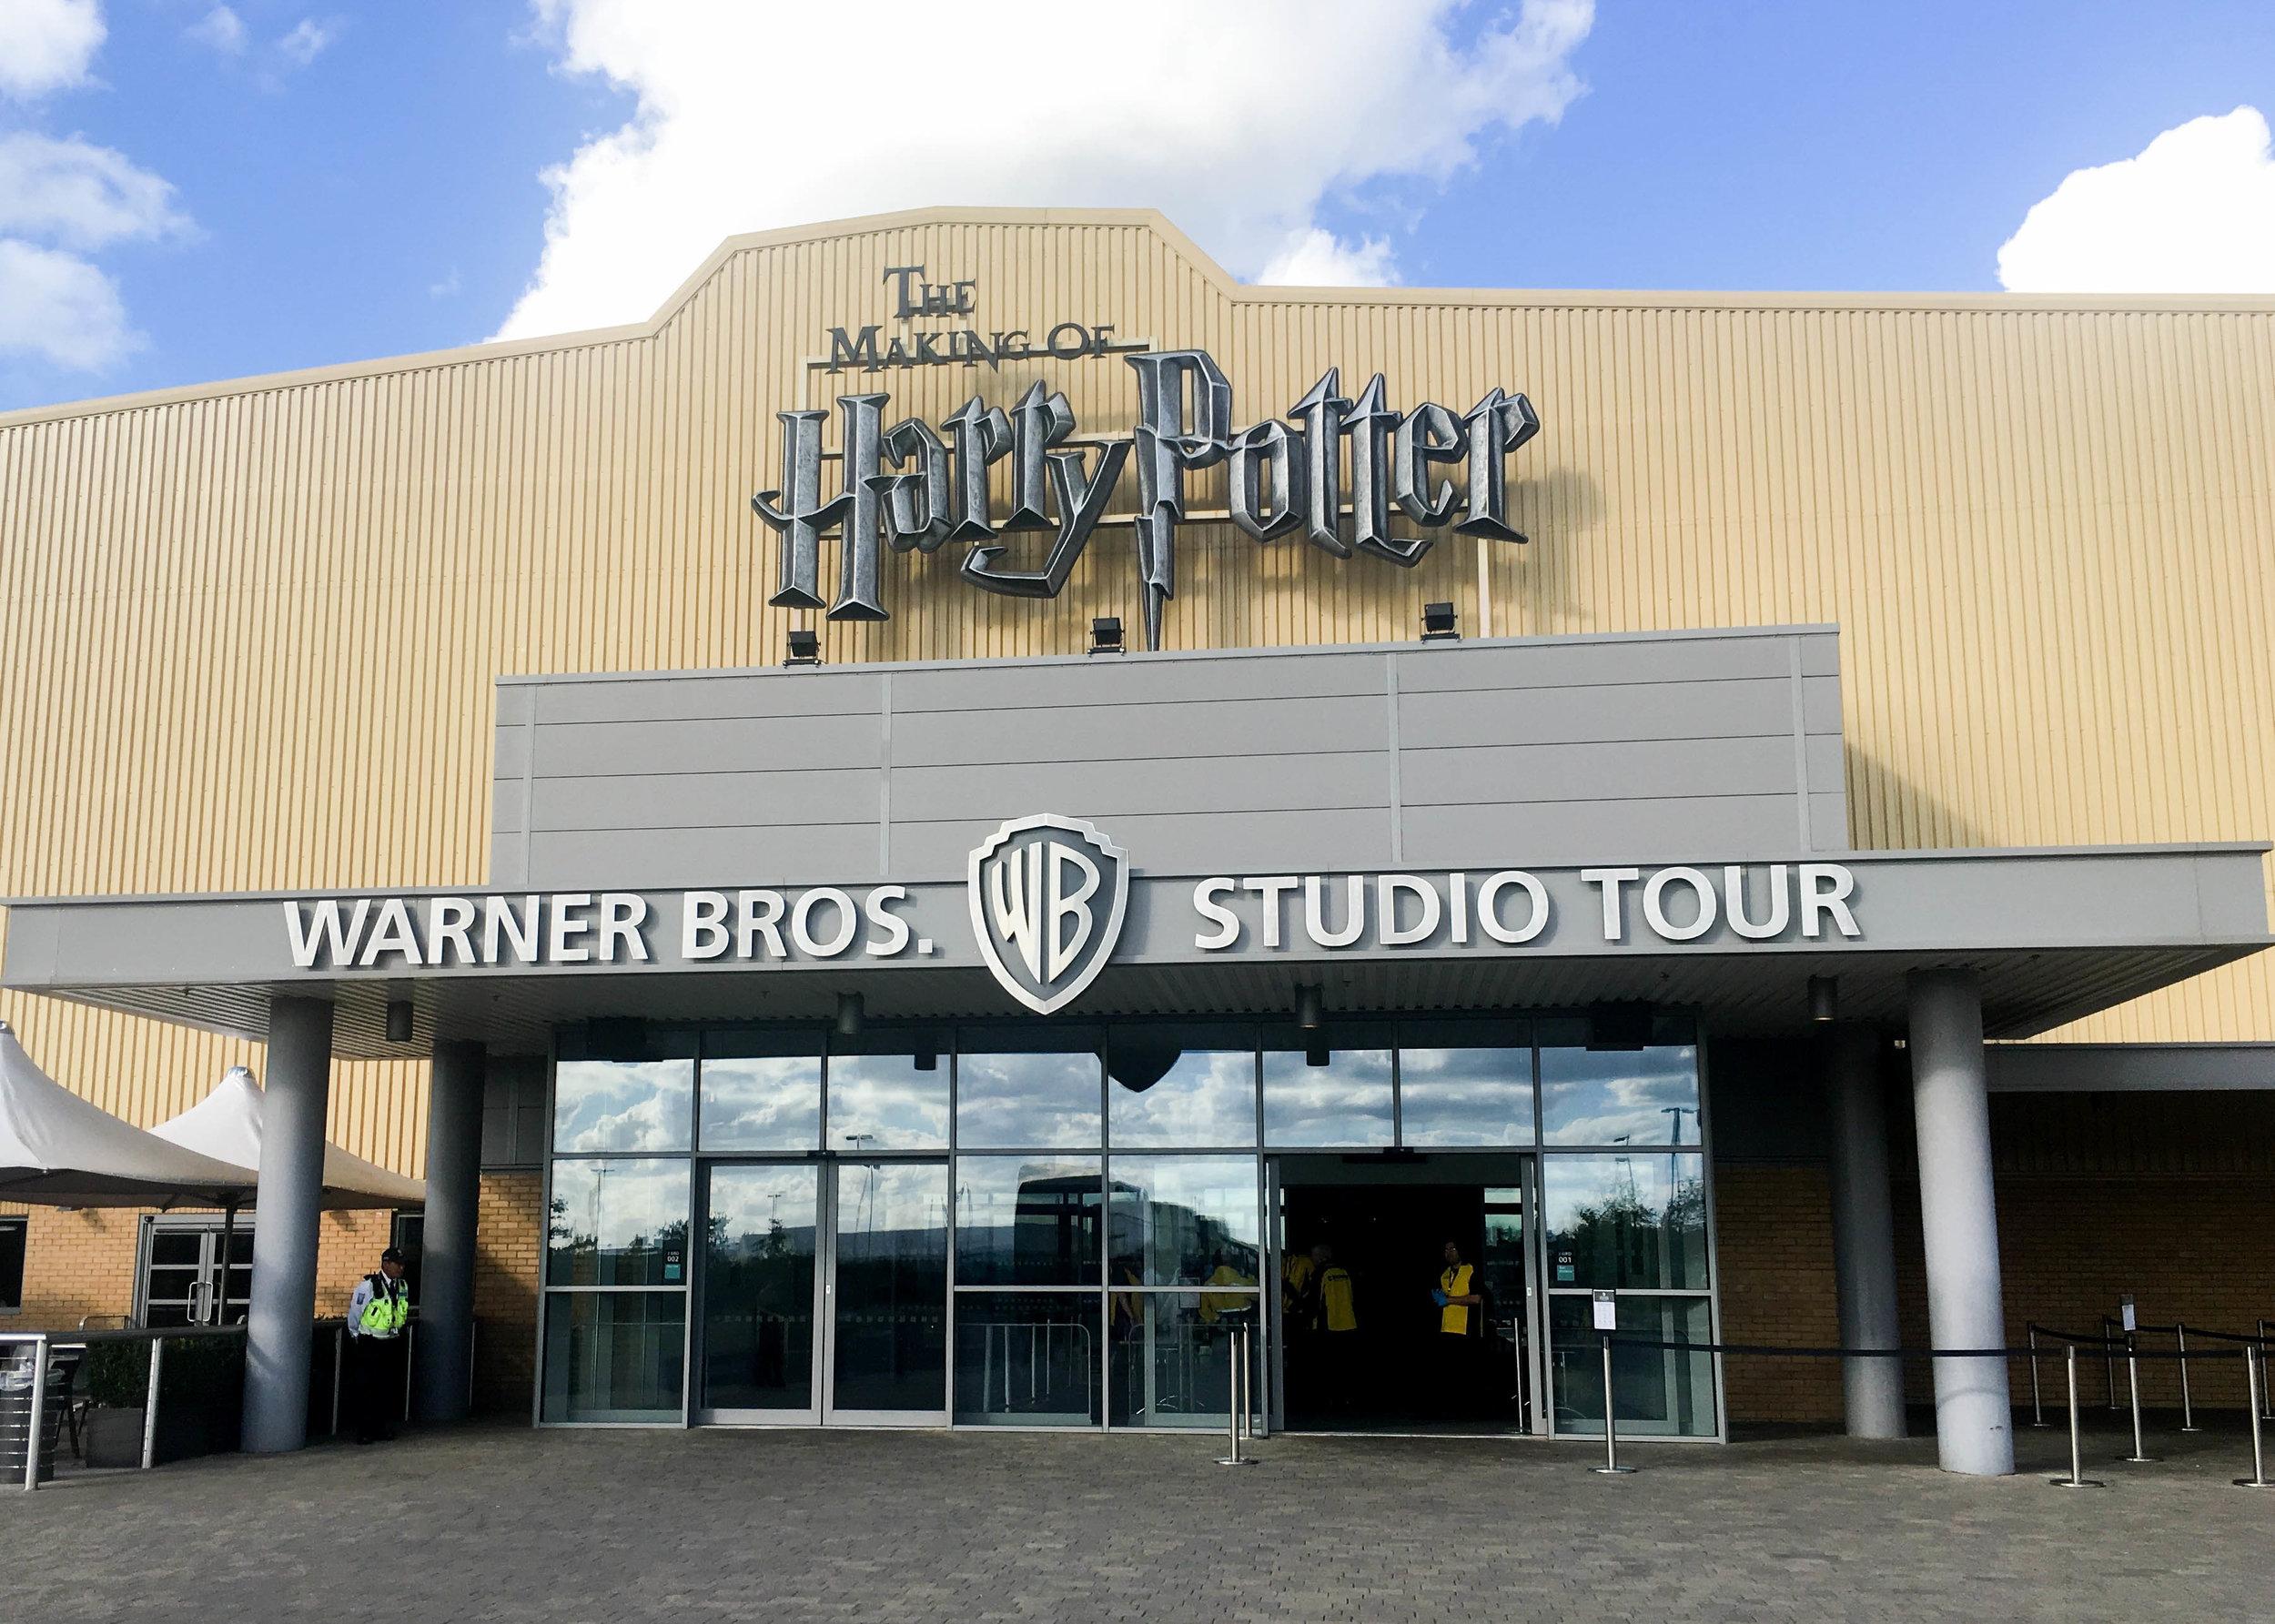 Warner Bros Harry Potter Studio Tour London.jpg